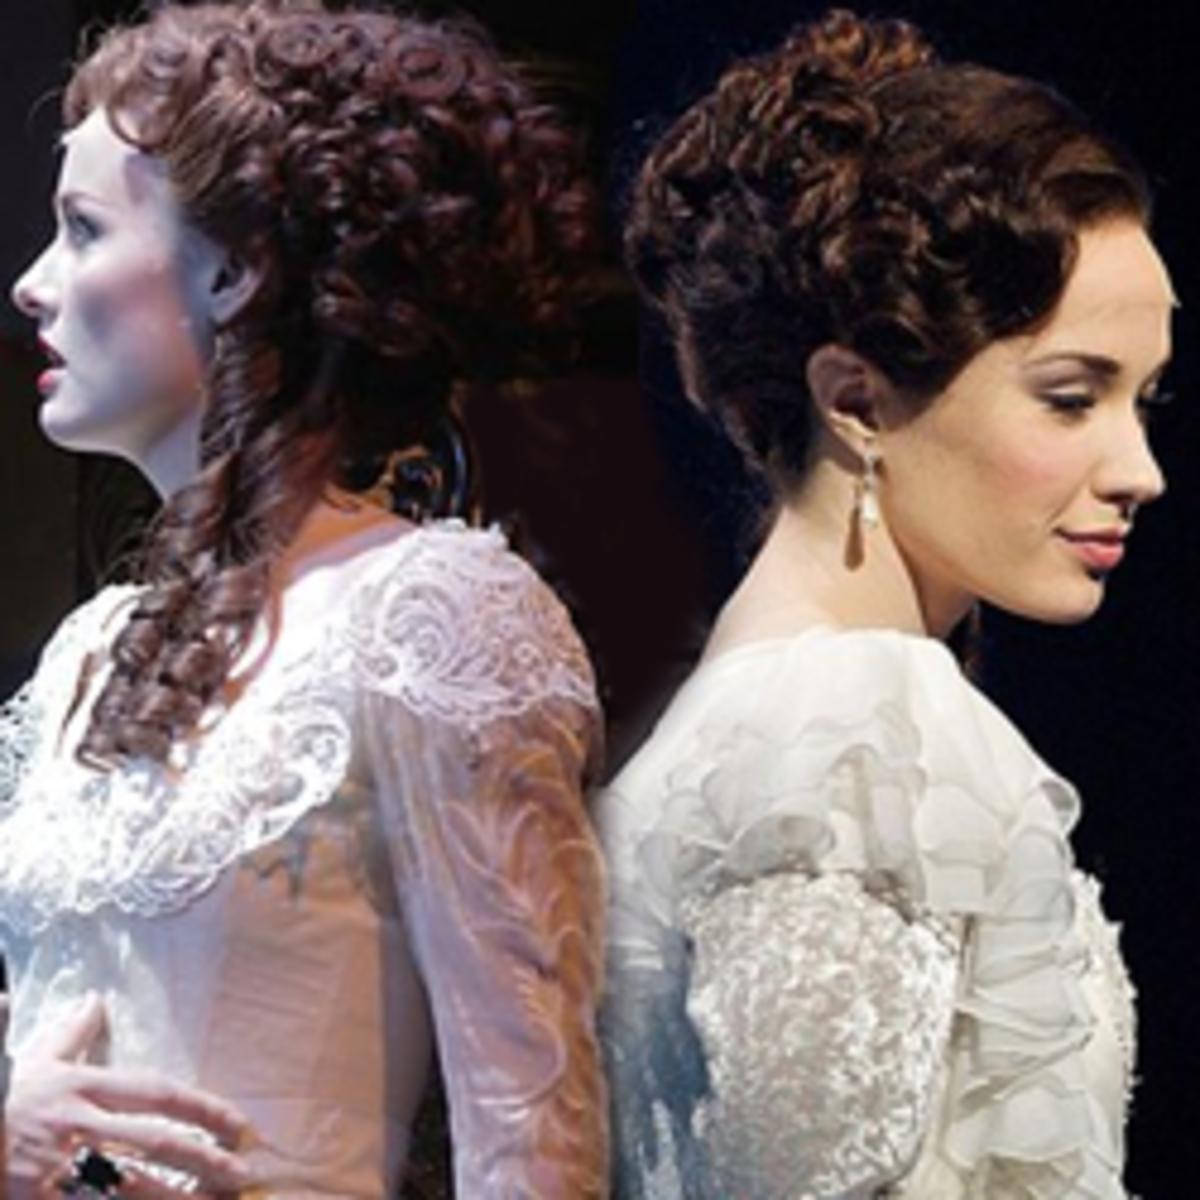 book report on the phantom of the opera